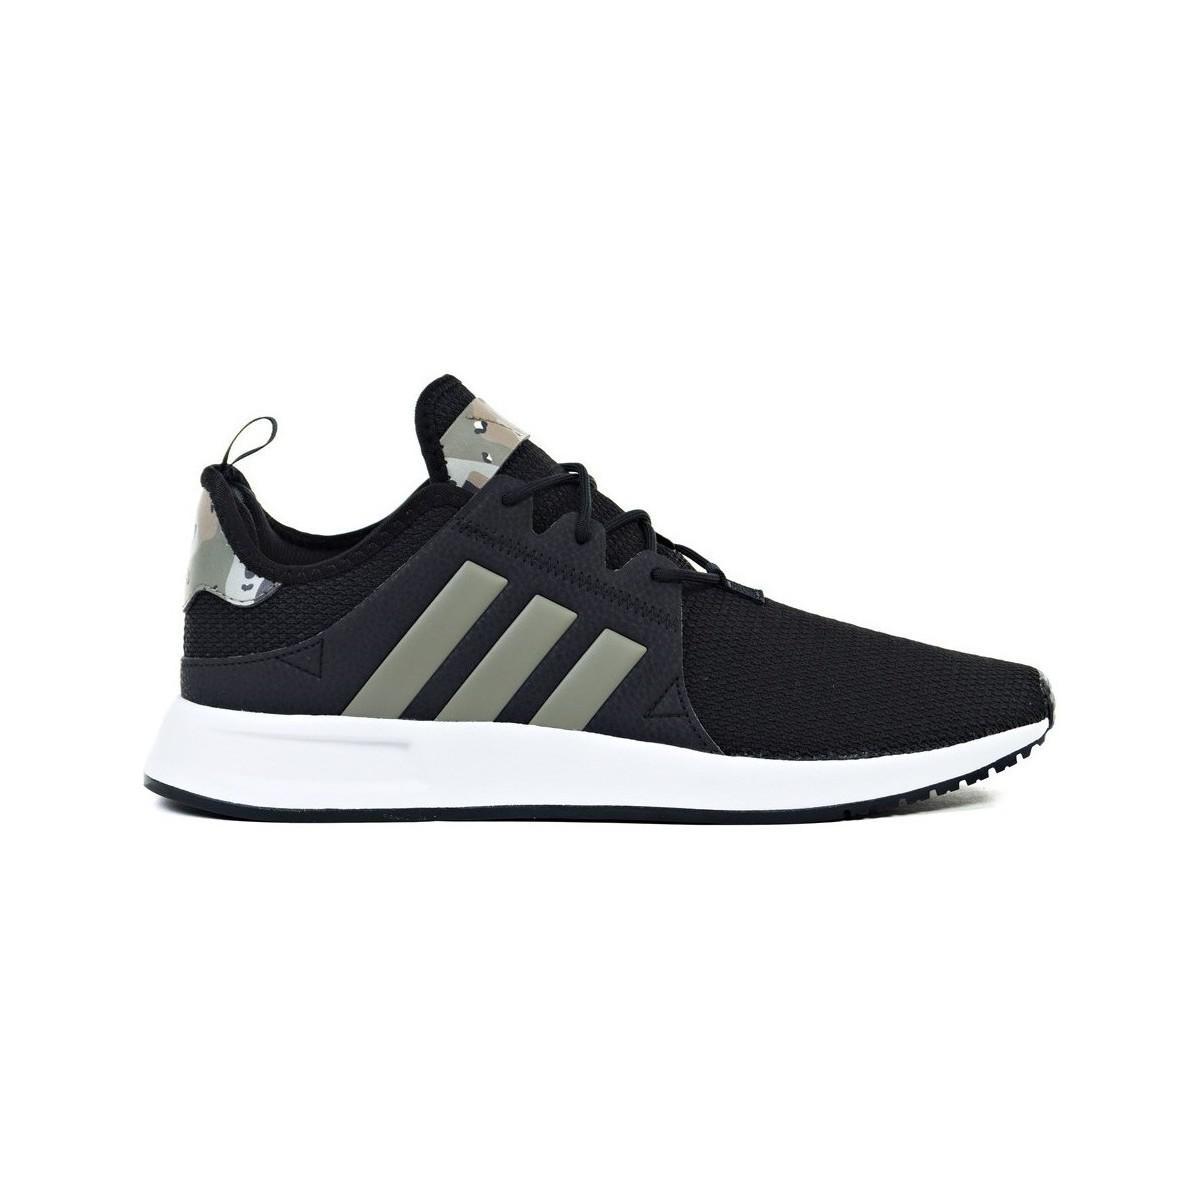 850e79e6350 Adidas Xplr Men s Shoes (trainers) In Black in Black for Men - Lyst